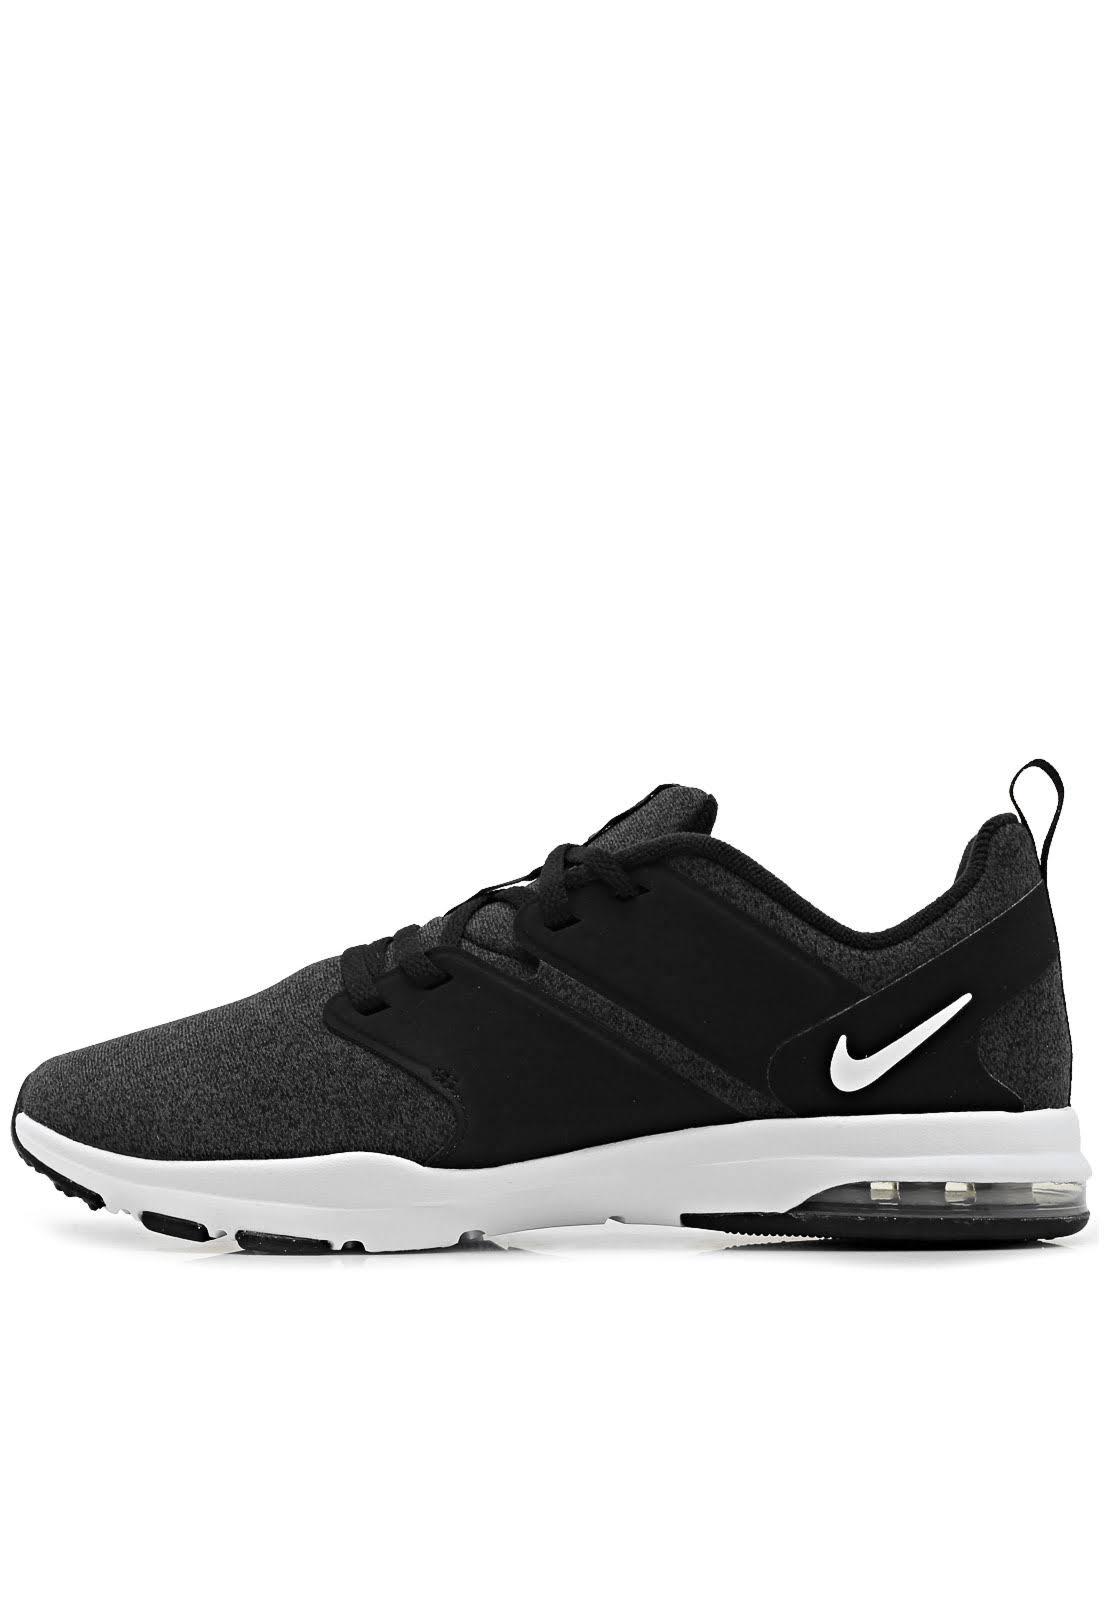 Scarpe Nike Air Scarpe Bel Nike TrNere Air Bel hCQrsdxt